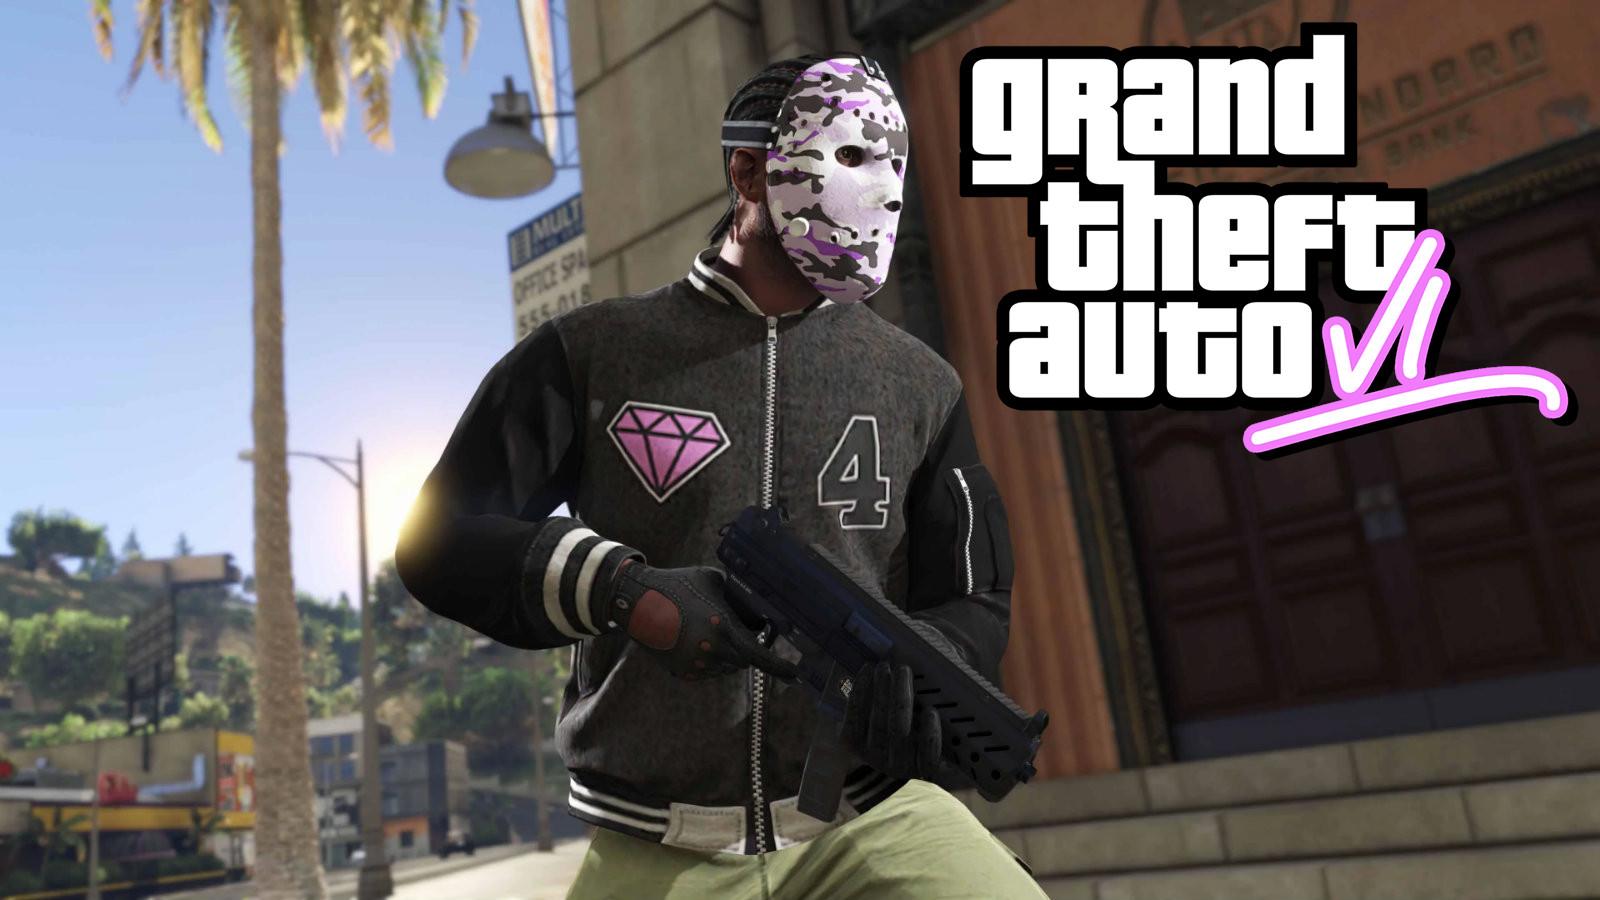 GTA Panther Varisty jacket